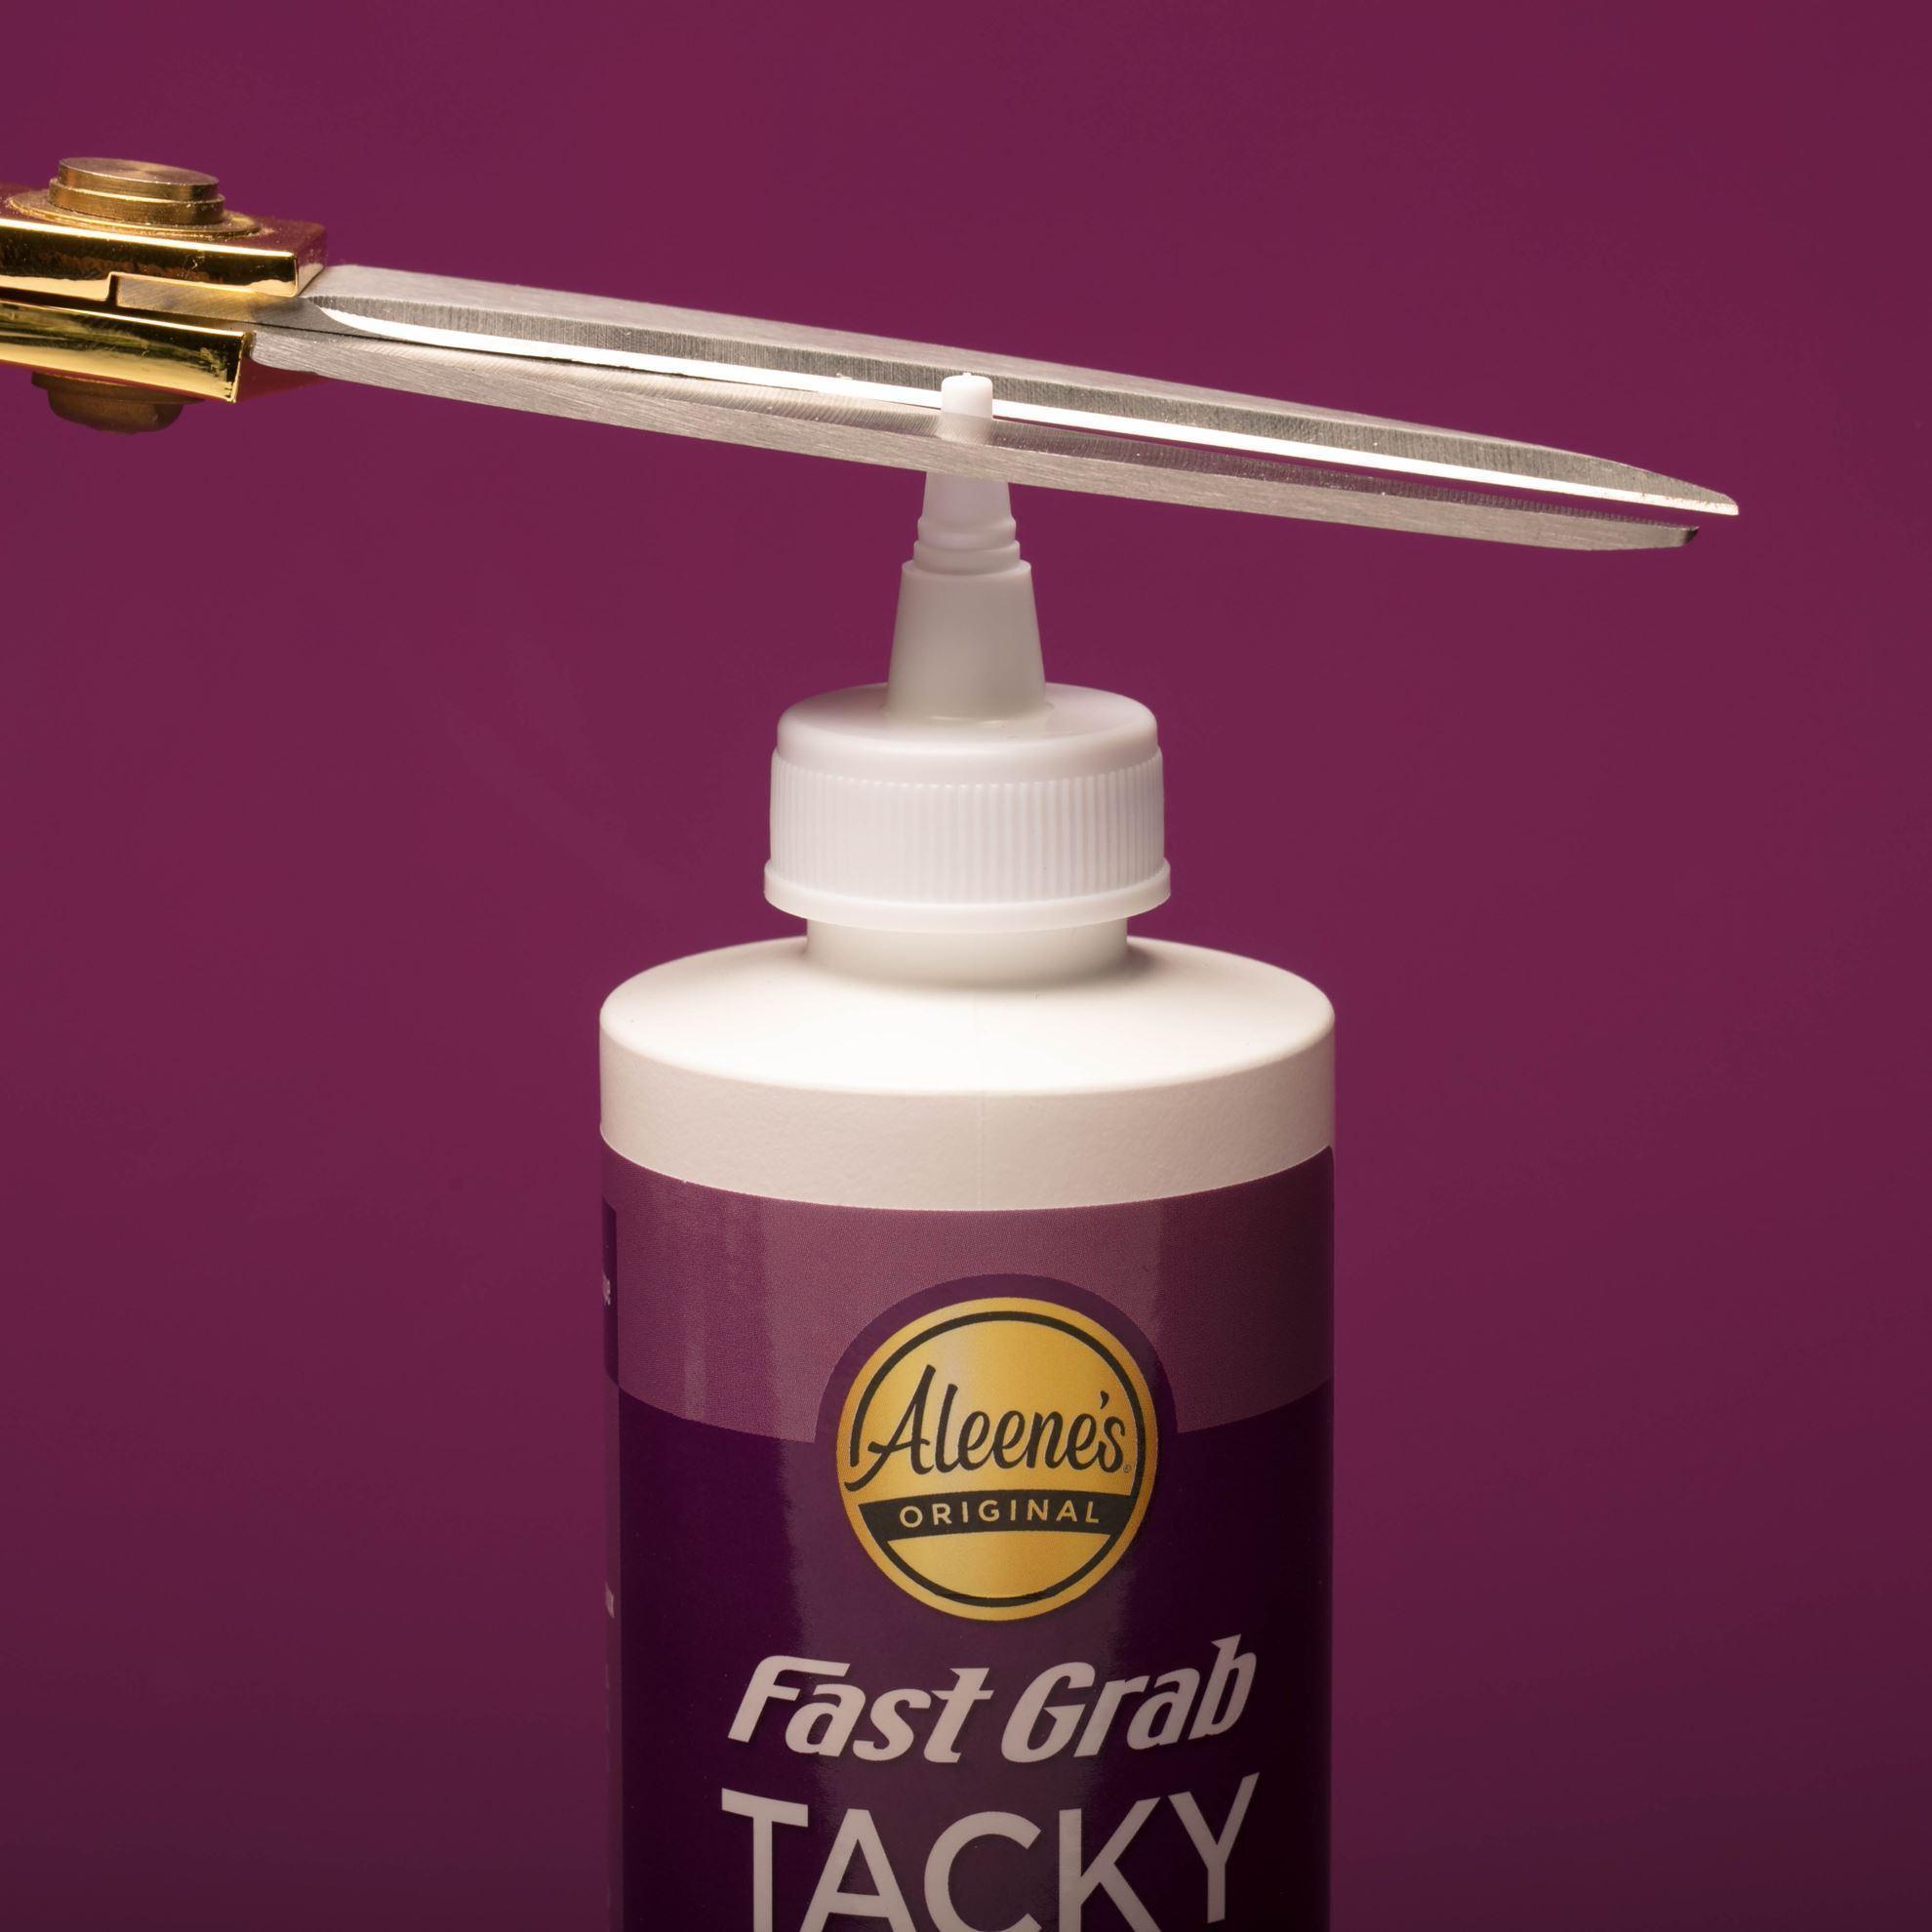 Aleene's® Fast Grab Tacky Glue tip